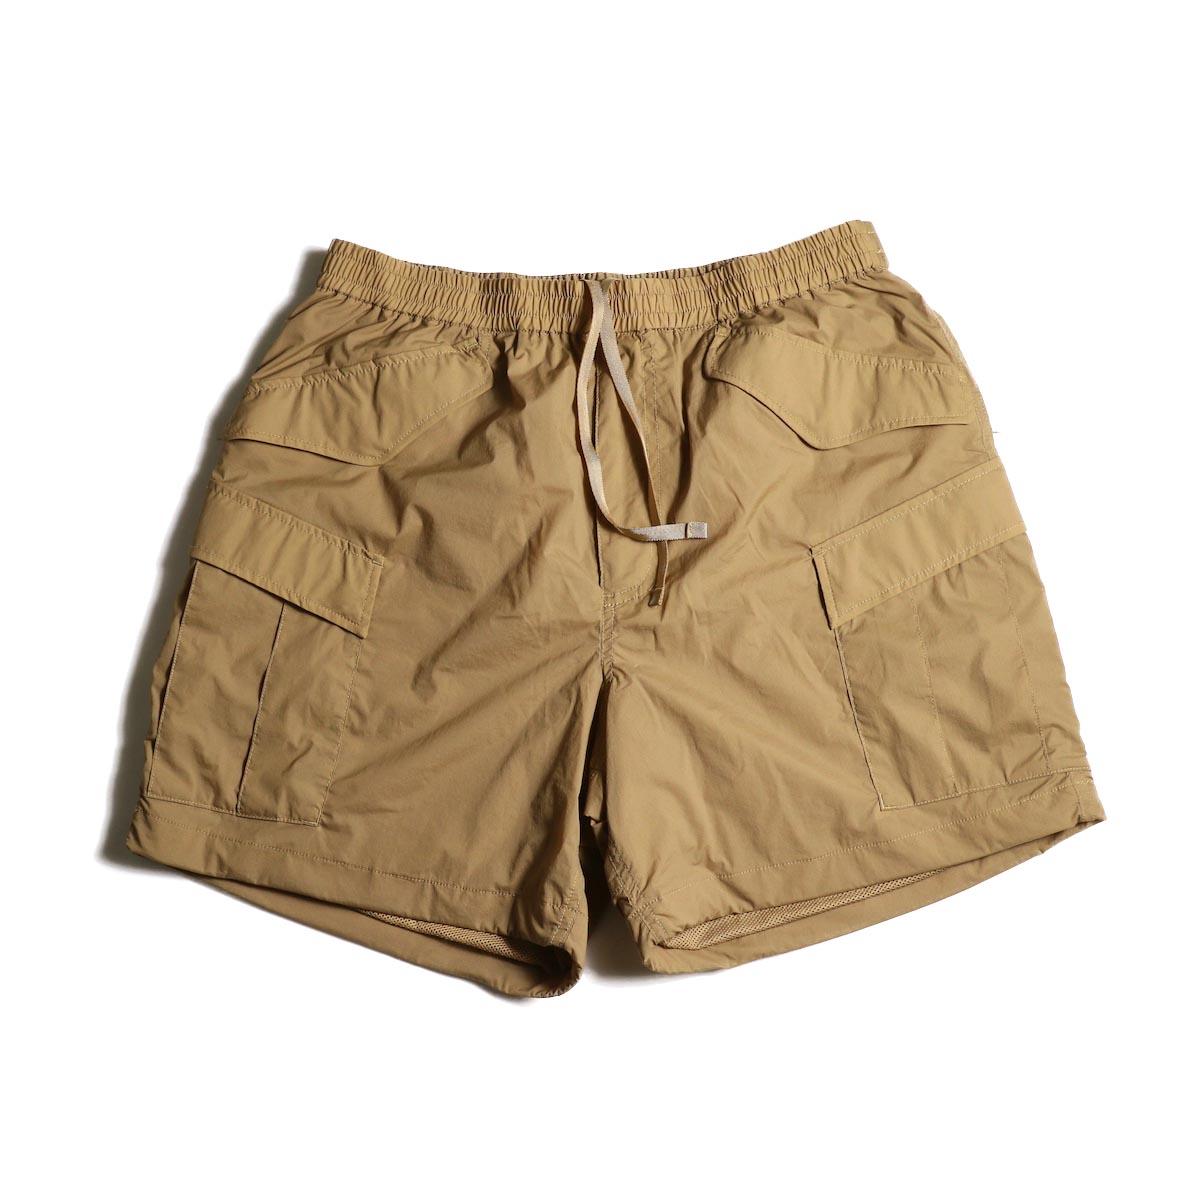 DAIWA PIER39 / Micro Rip-Stop Easy 6P Shorts (Tan)